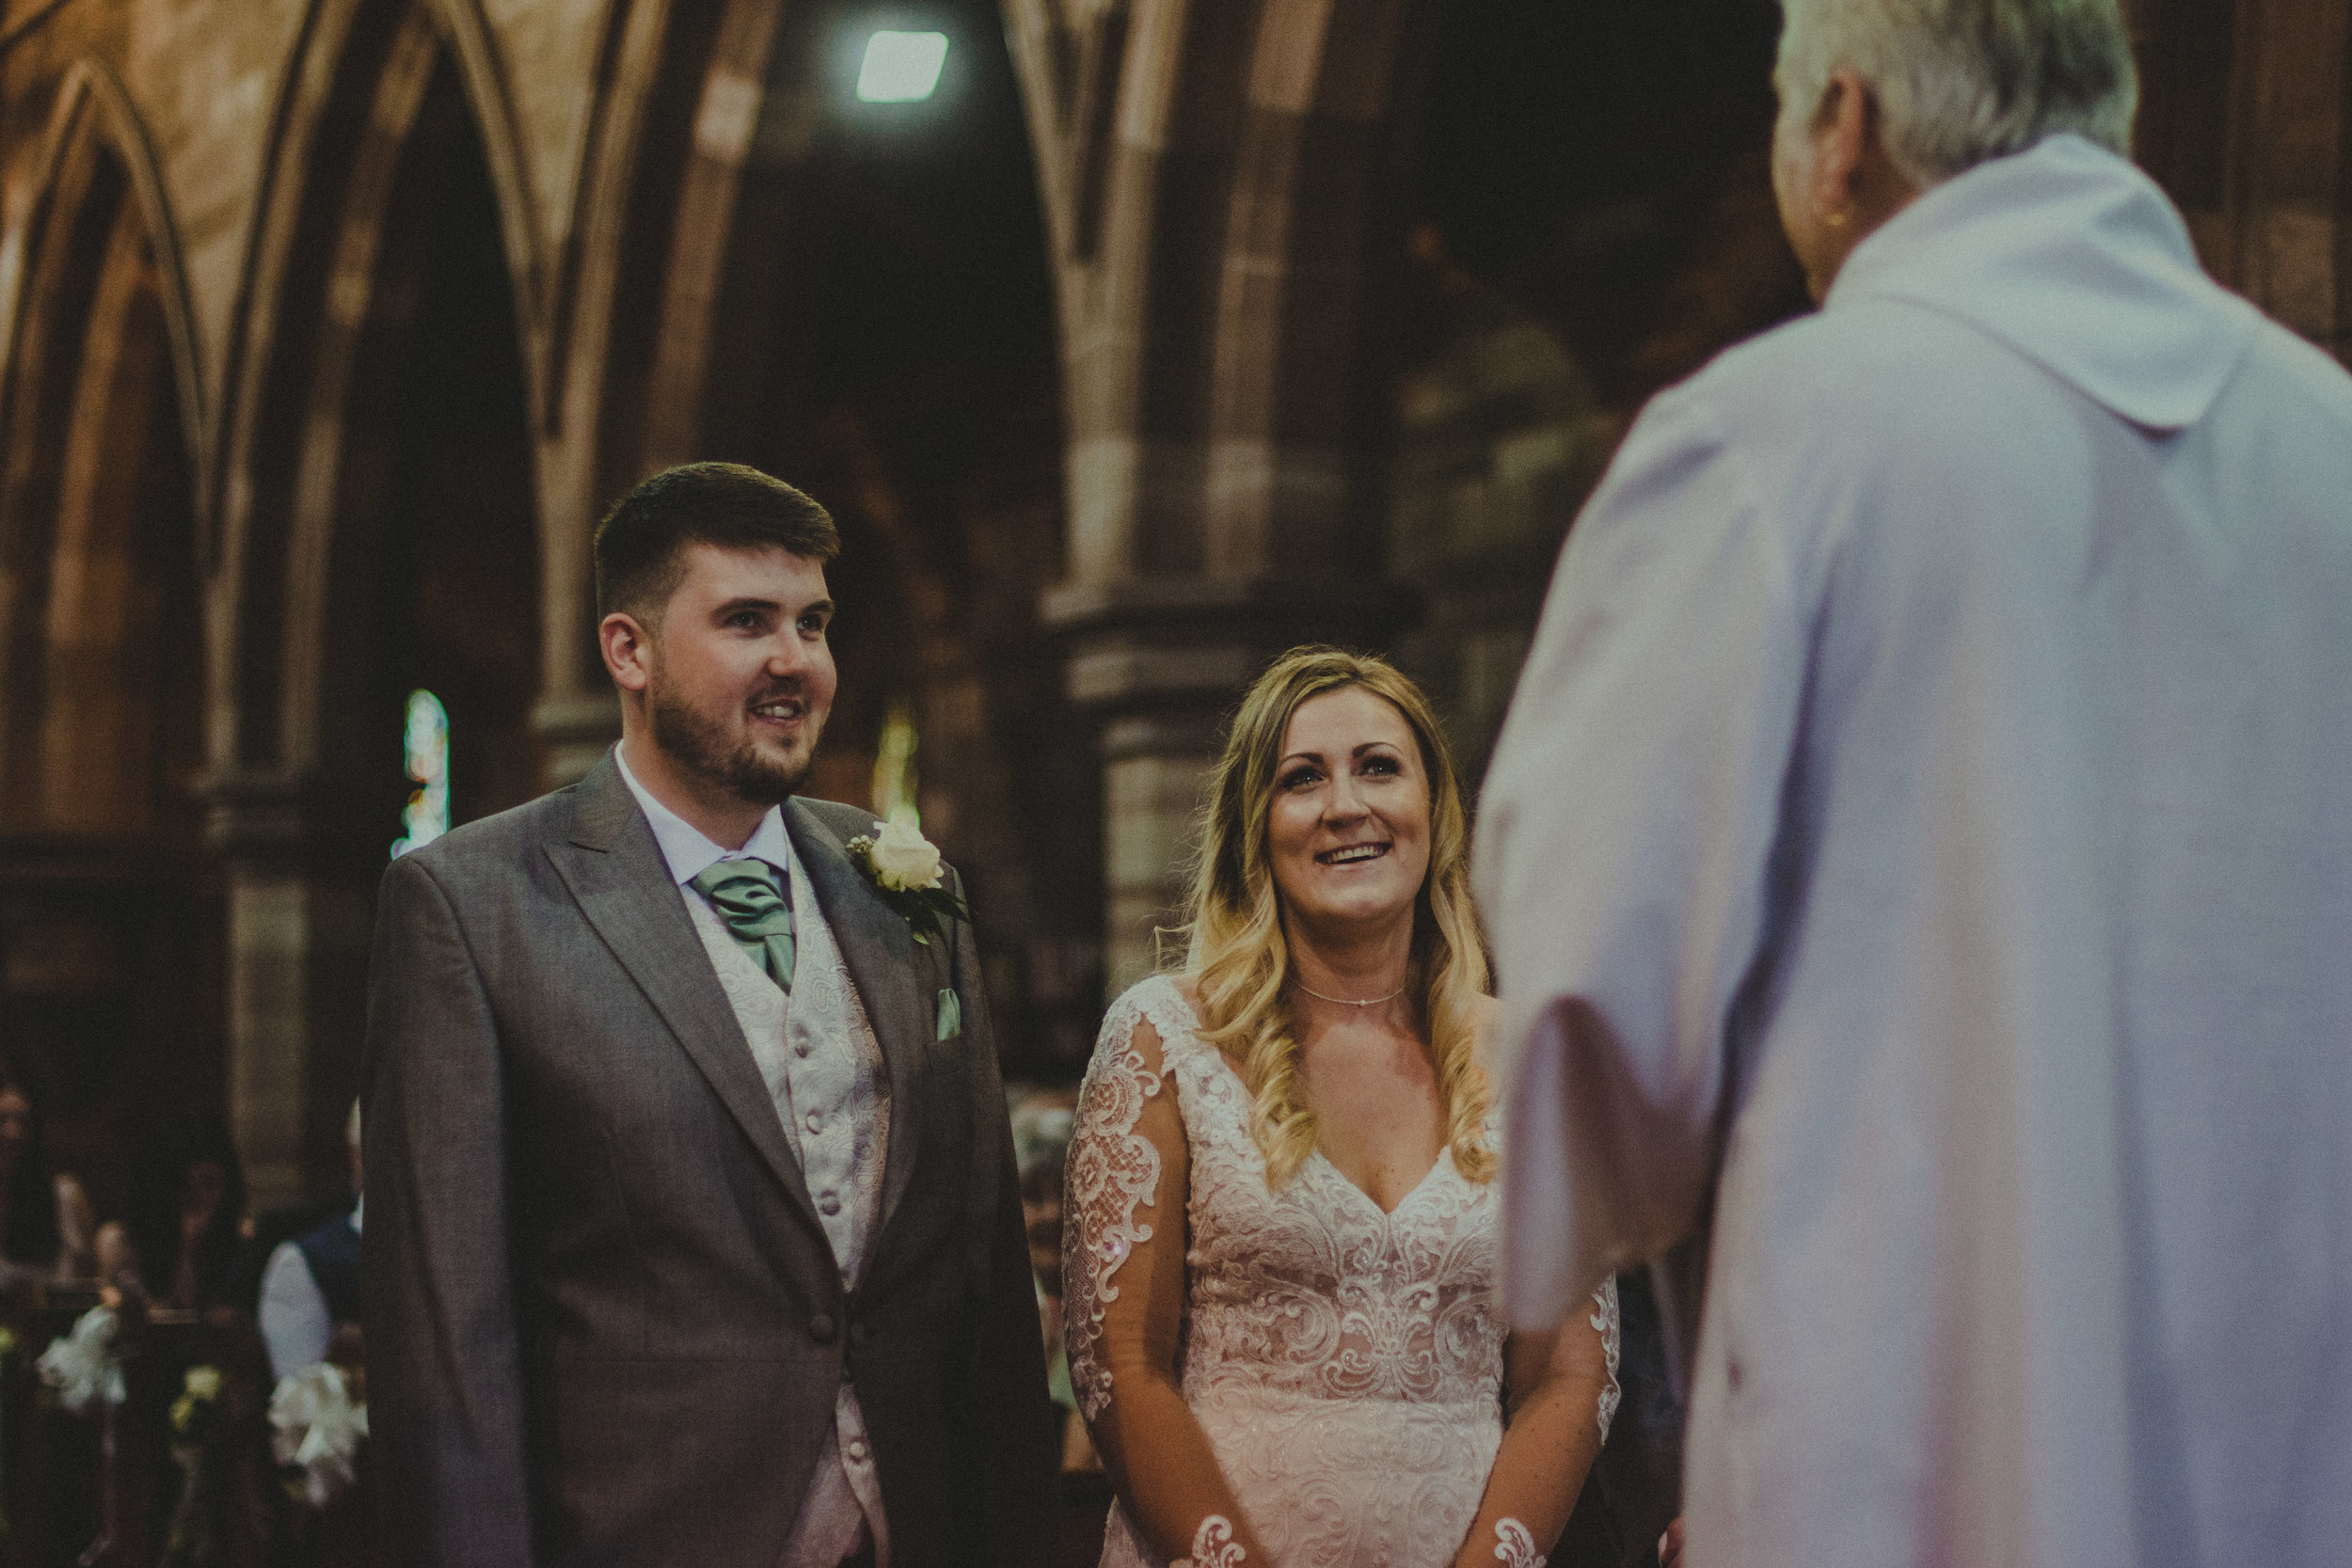 Cheshire wedding Photographer wedding photographer engagement photographer carlisle wedding photographer Glasgow wedding photographer lancashire wedding photographer (1 of 1)-4.jpg